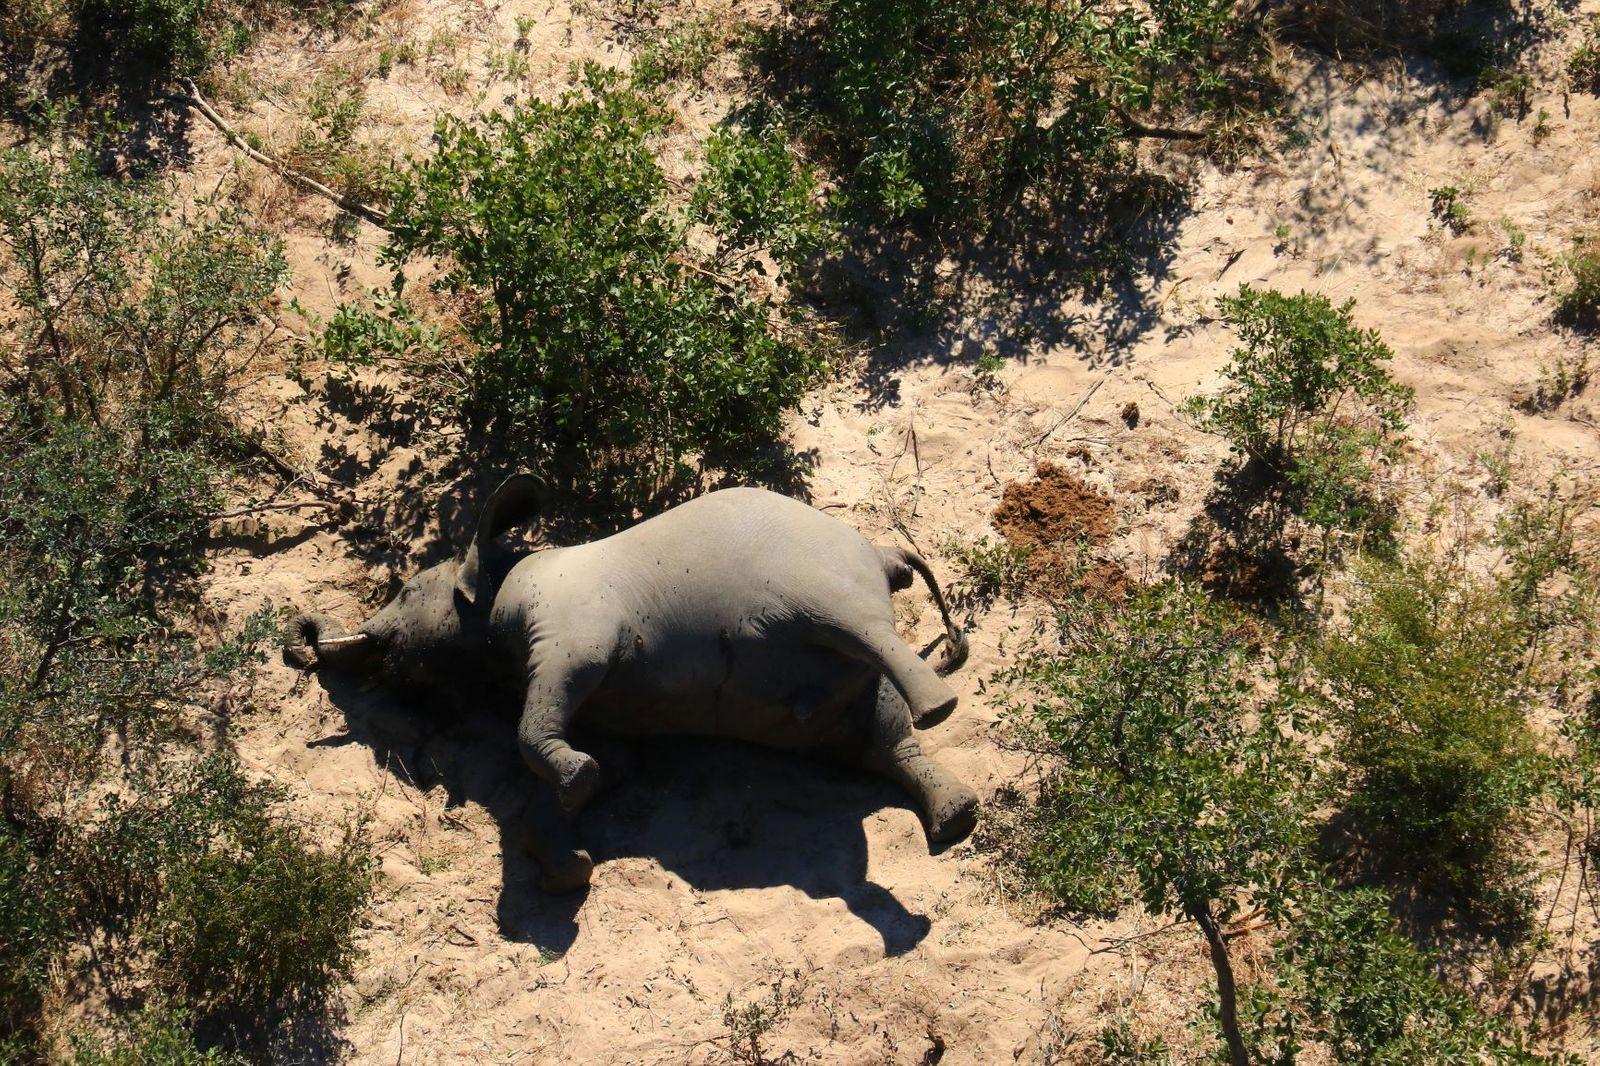 FILES-BOTSWANA-WILDLIFE-CONSERVATION